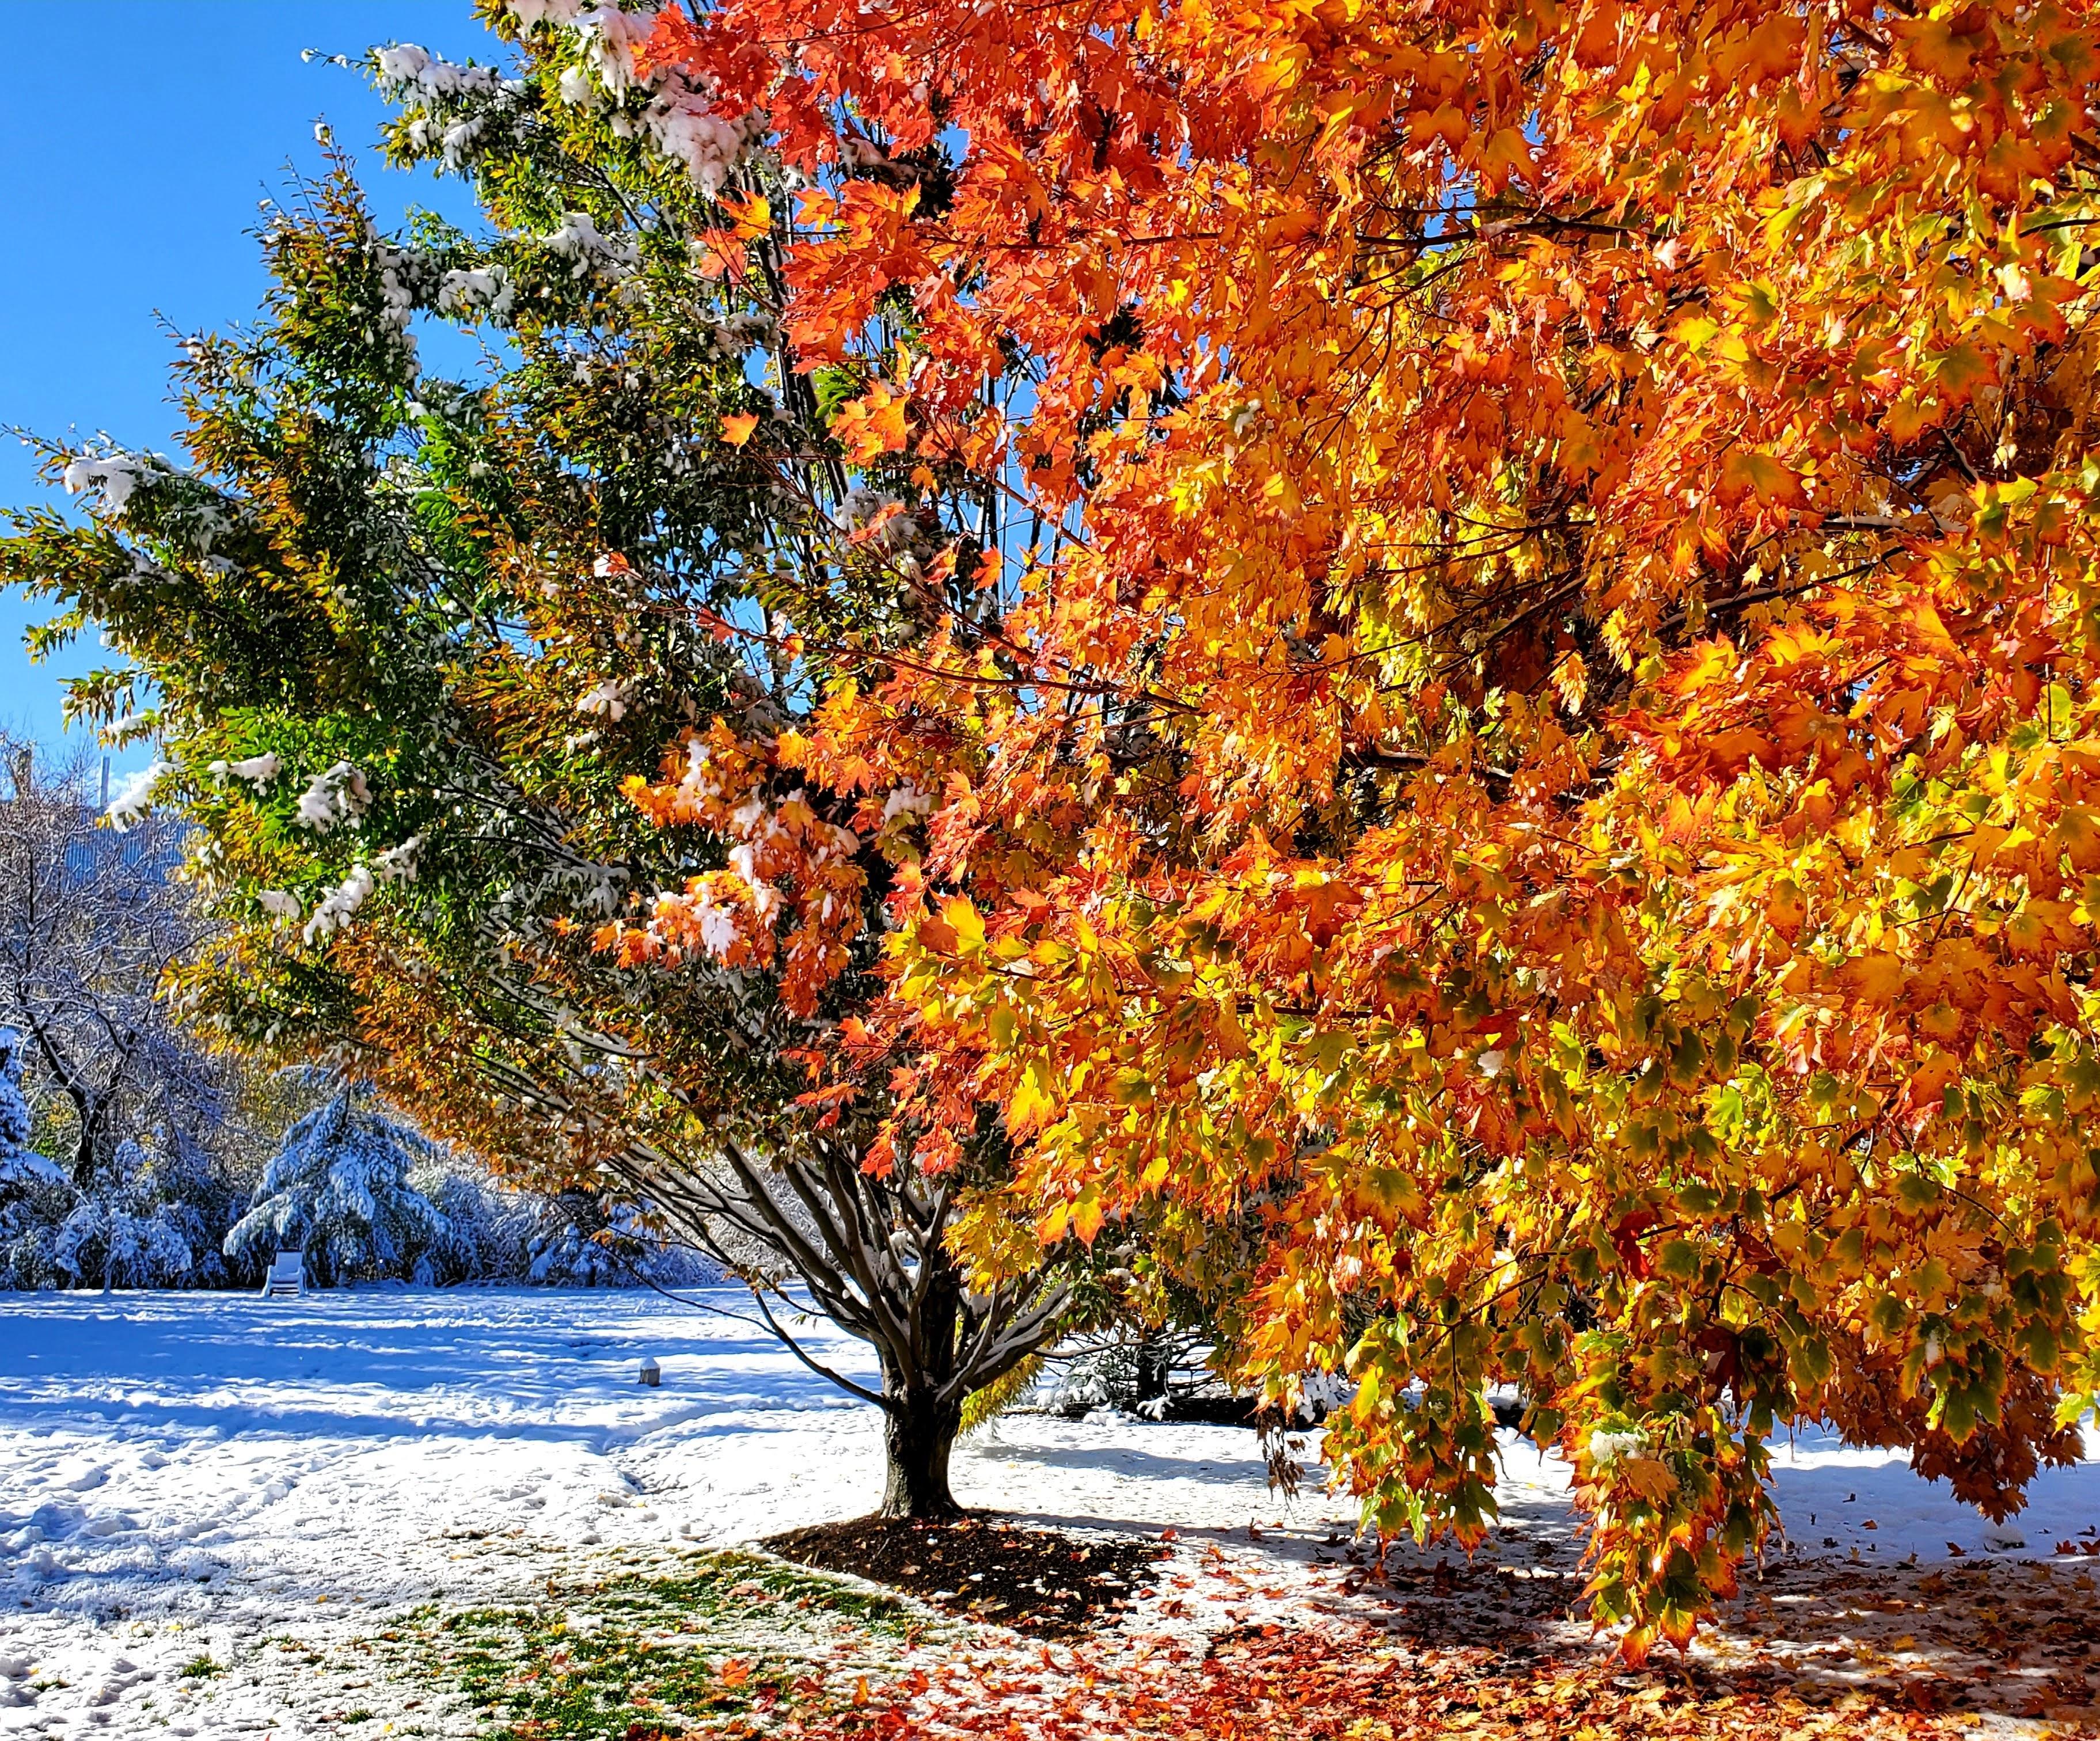 bright orange leaves against the snow